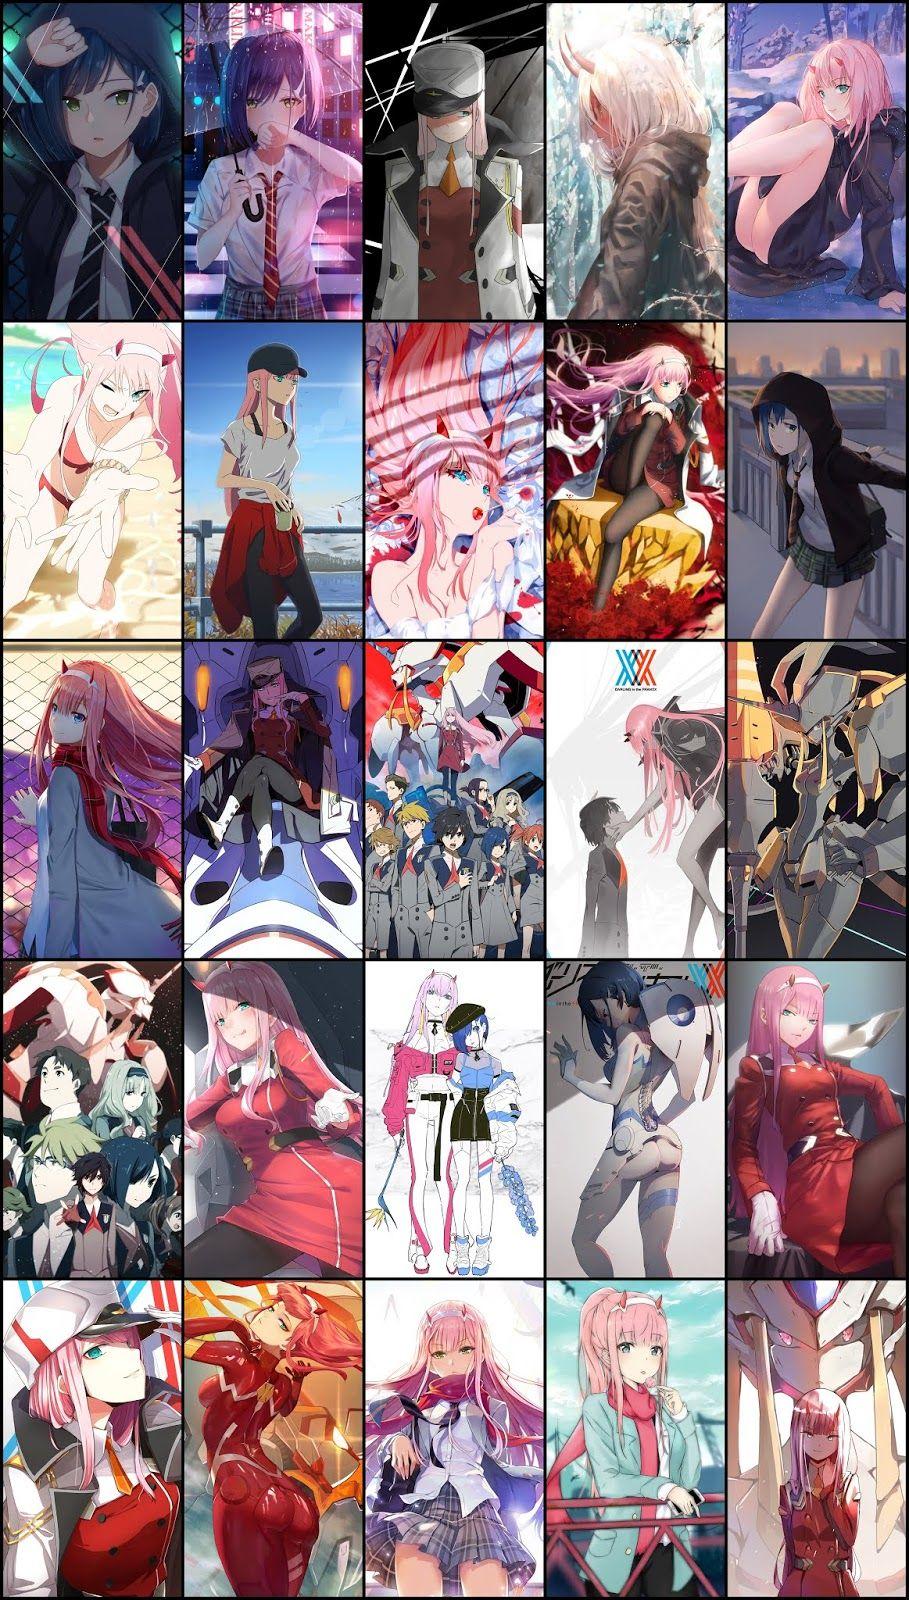 Wallpaper Pack Darling In The Franxx For Android Phone Part 01 Darling In The Franxx Anime Background Anime